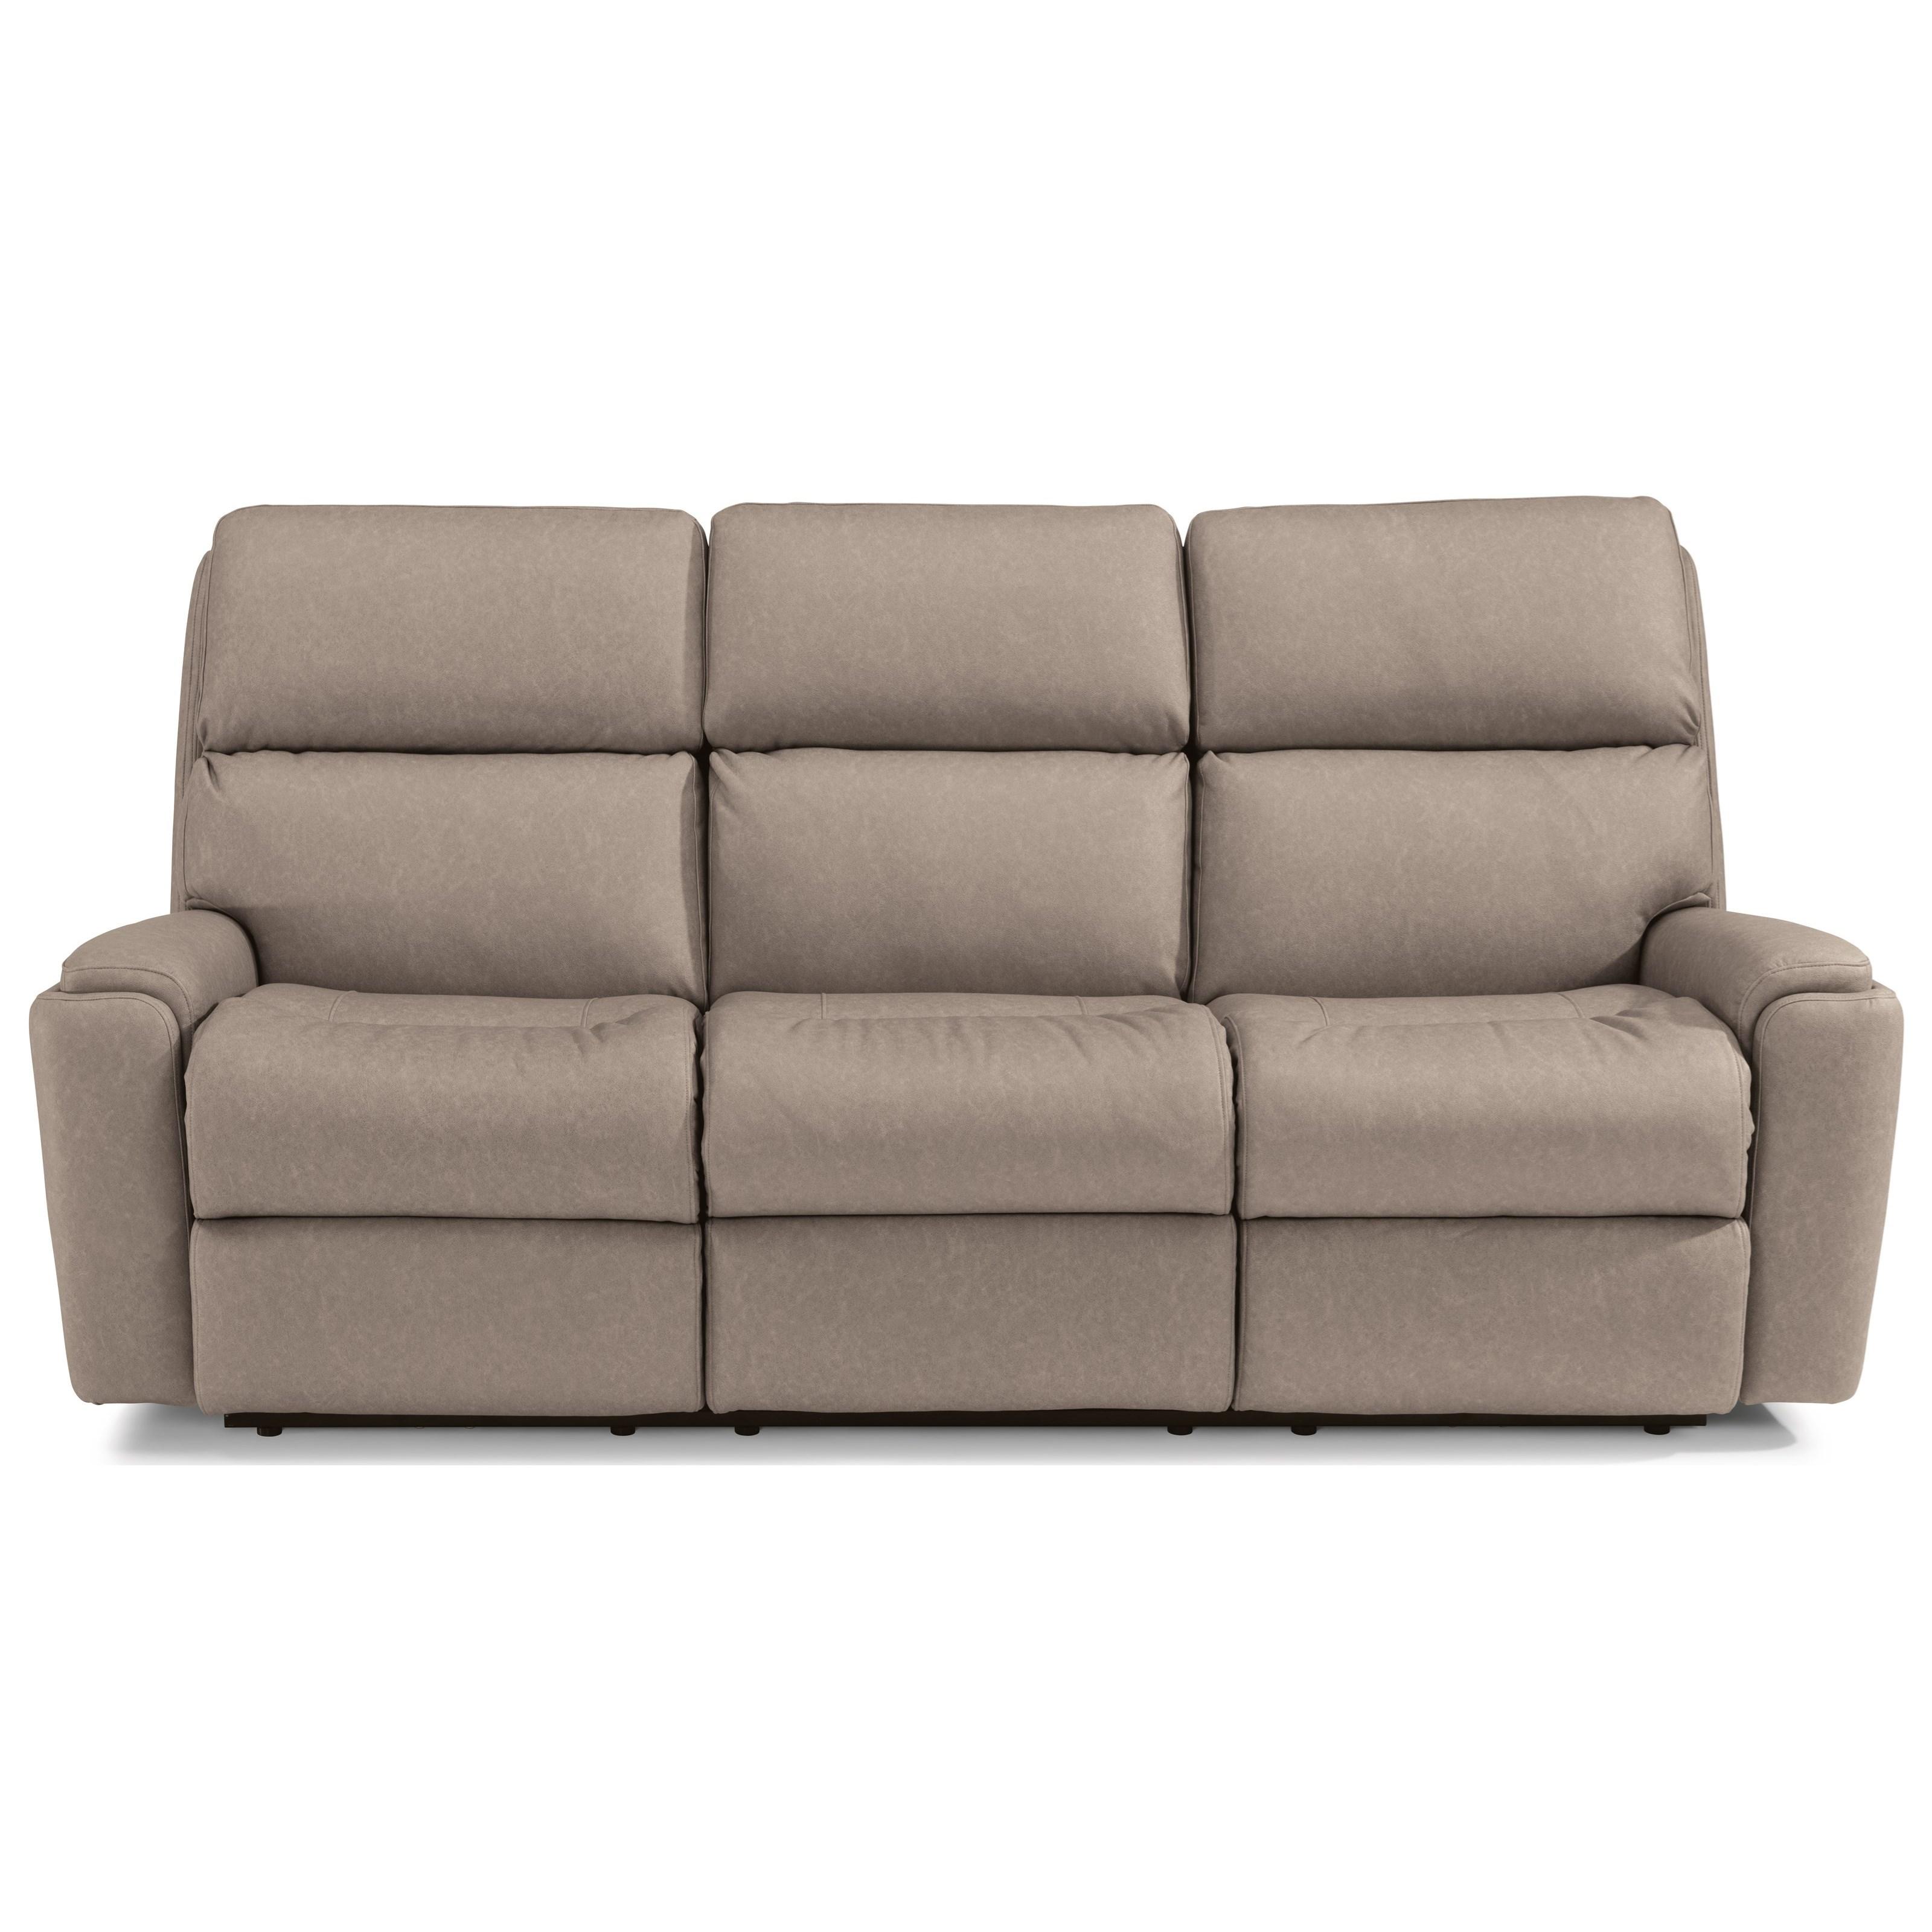 Rio Reclining Sofa by Flexsteel at Walker's Furniture